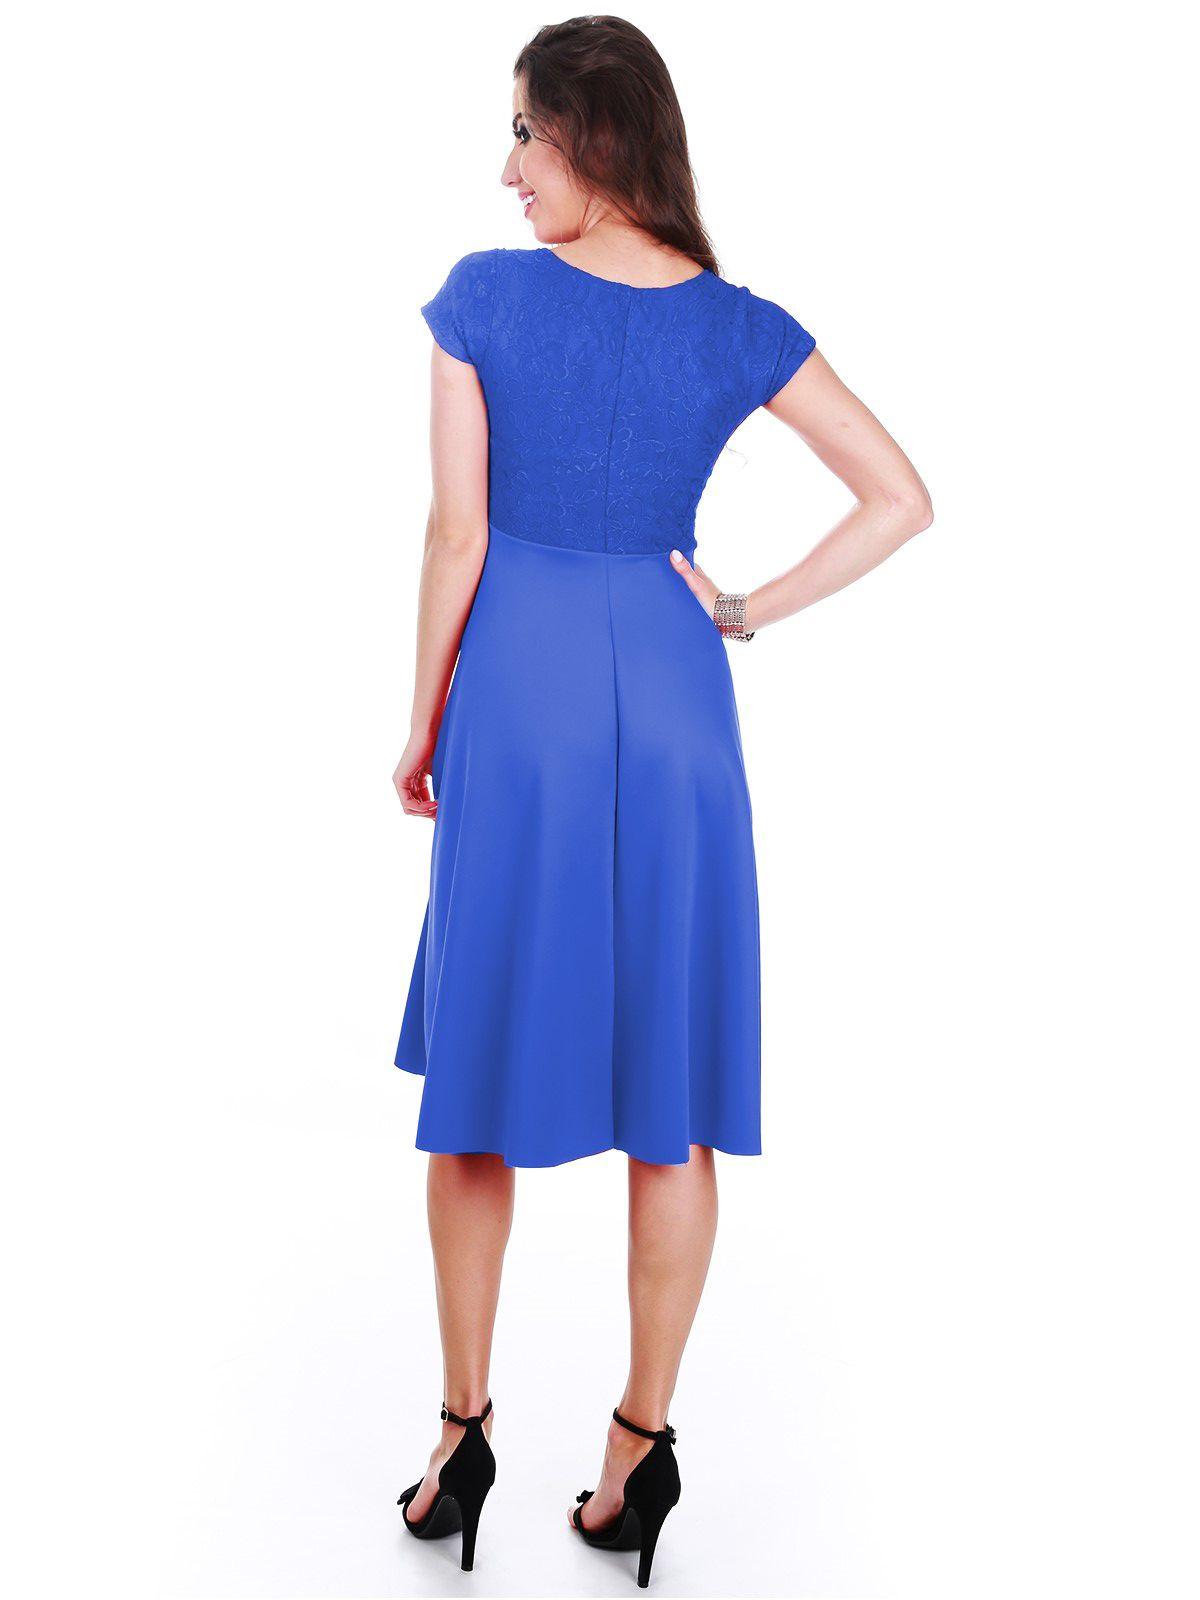 Vestido Godê Renda Azul